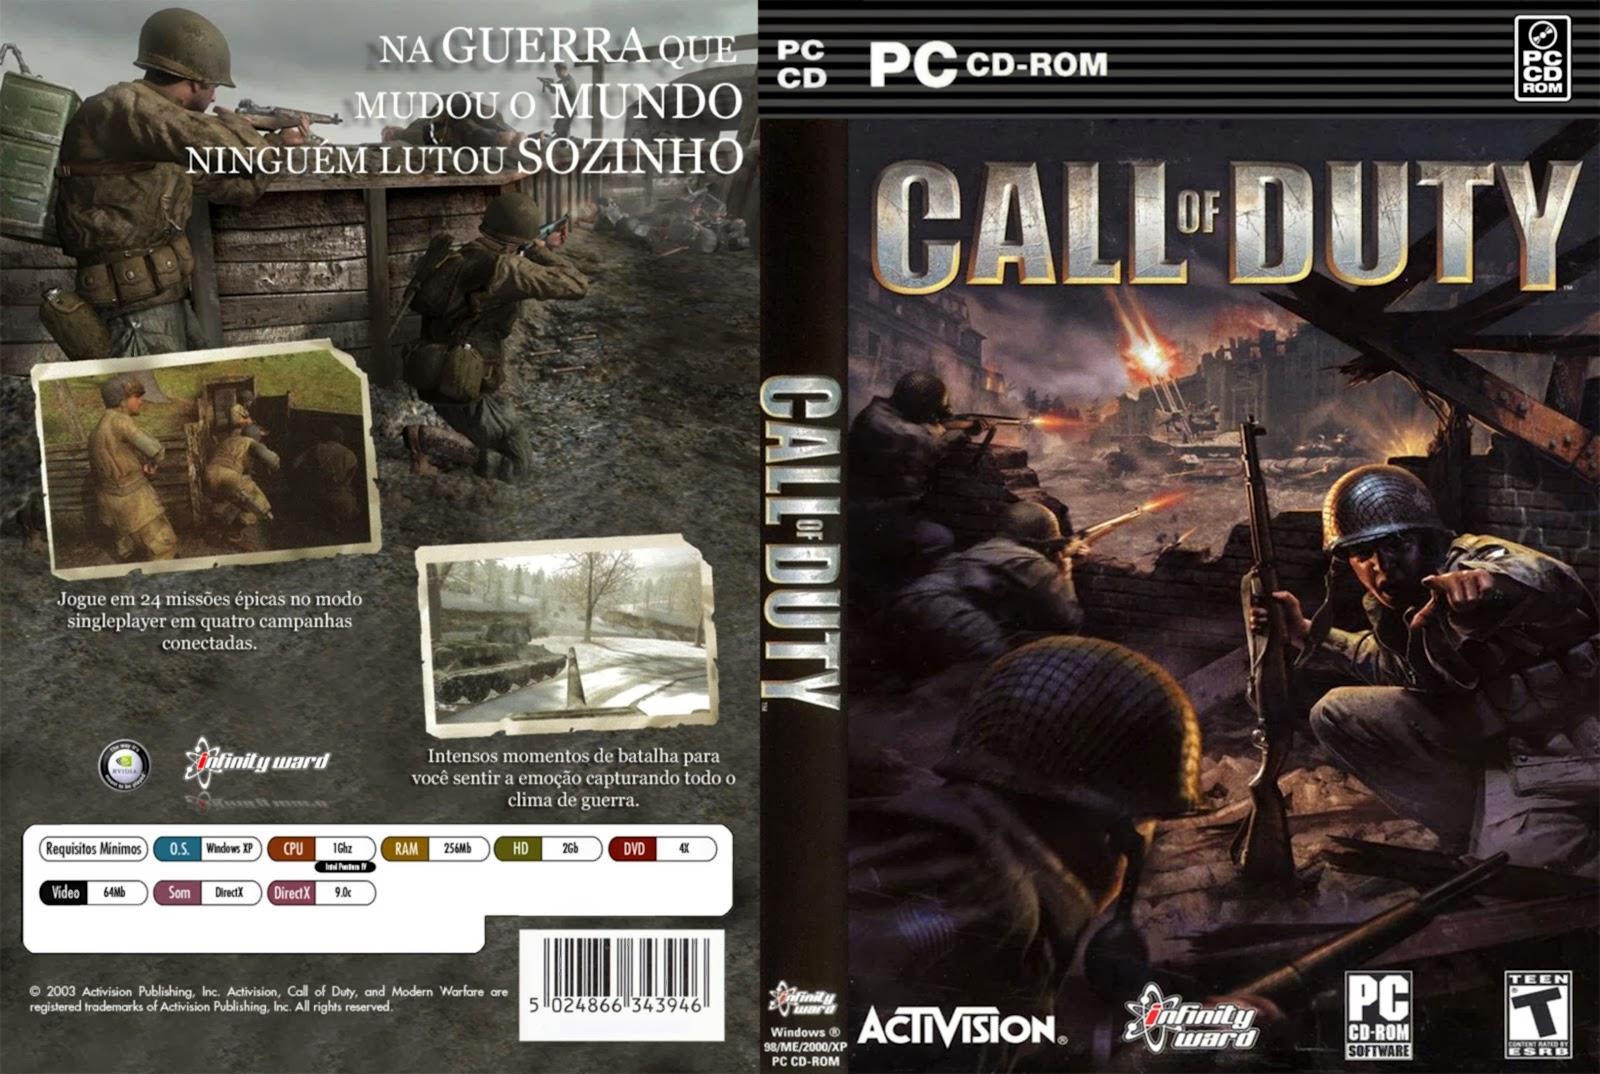 Jogo Call Of Duty 1 PC DVD Capa